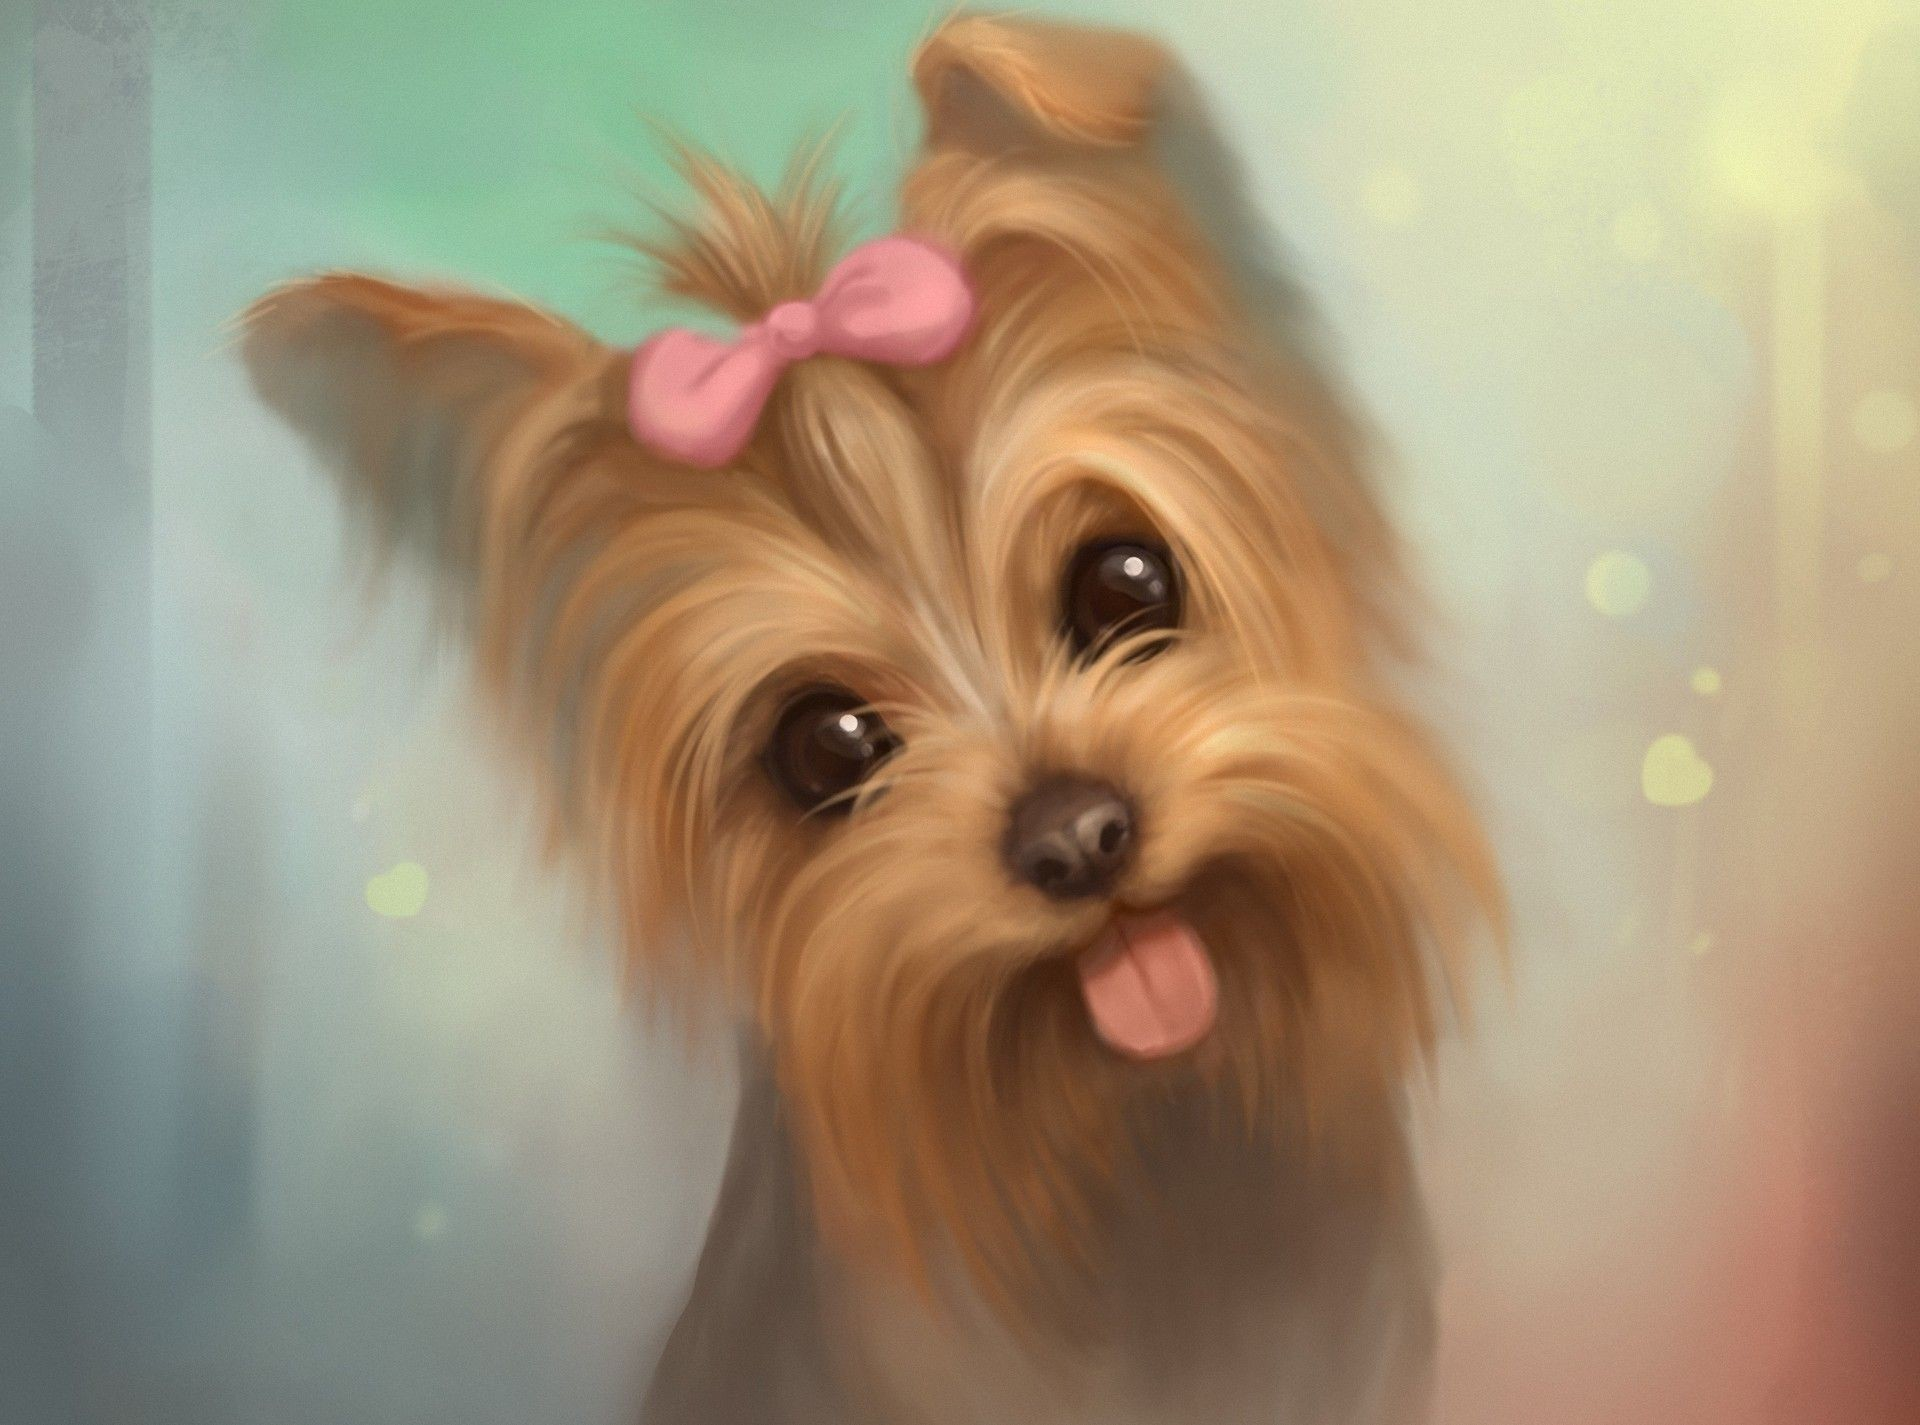 Cute Puppy Wallpaper Backgrounds. Cute Dogs Wallpaper Desktop .